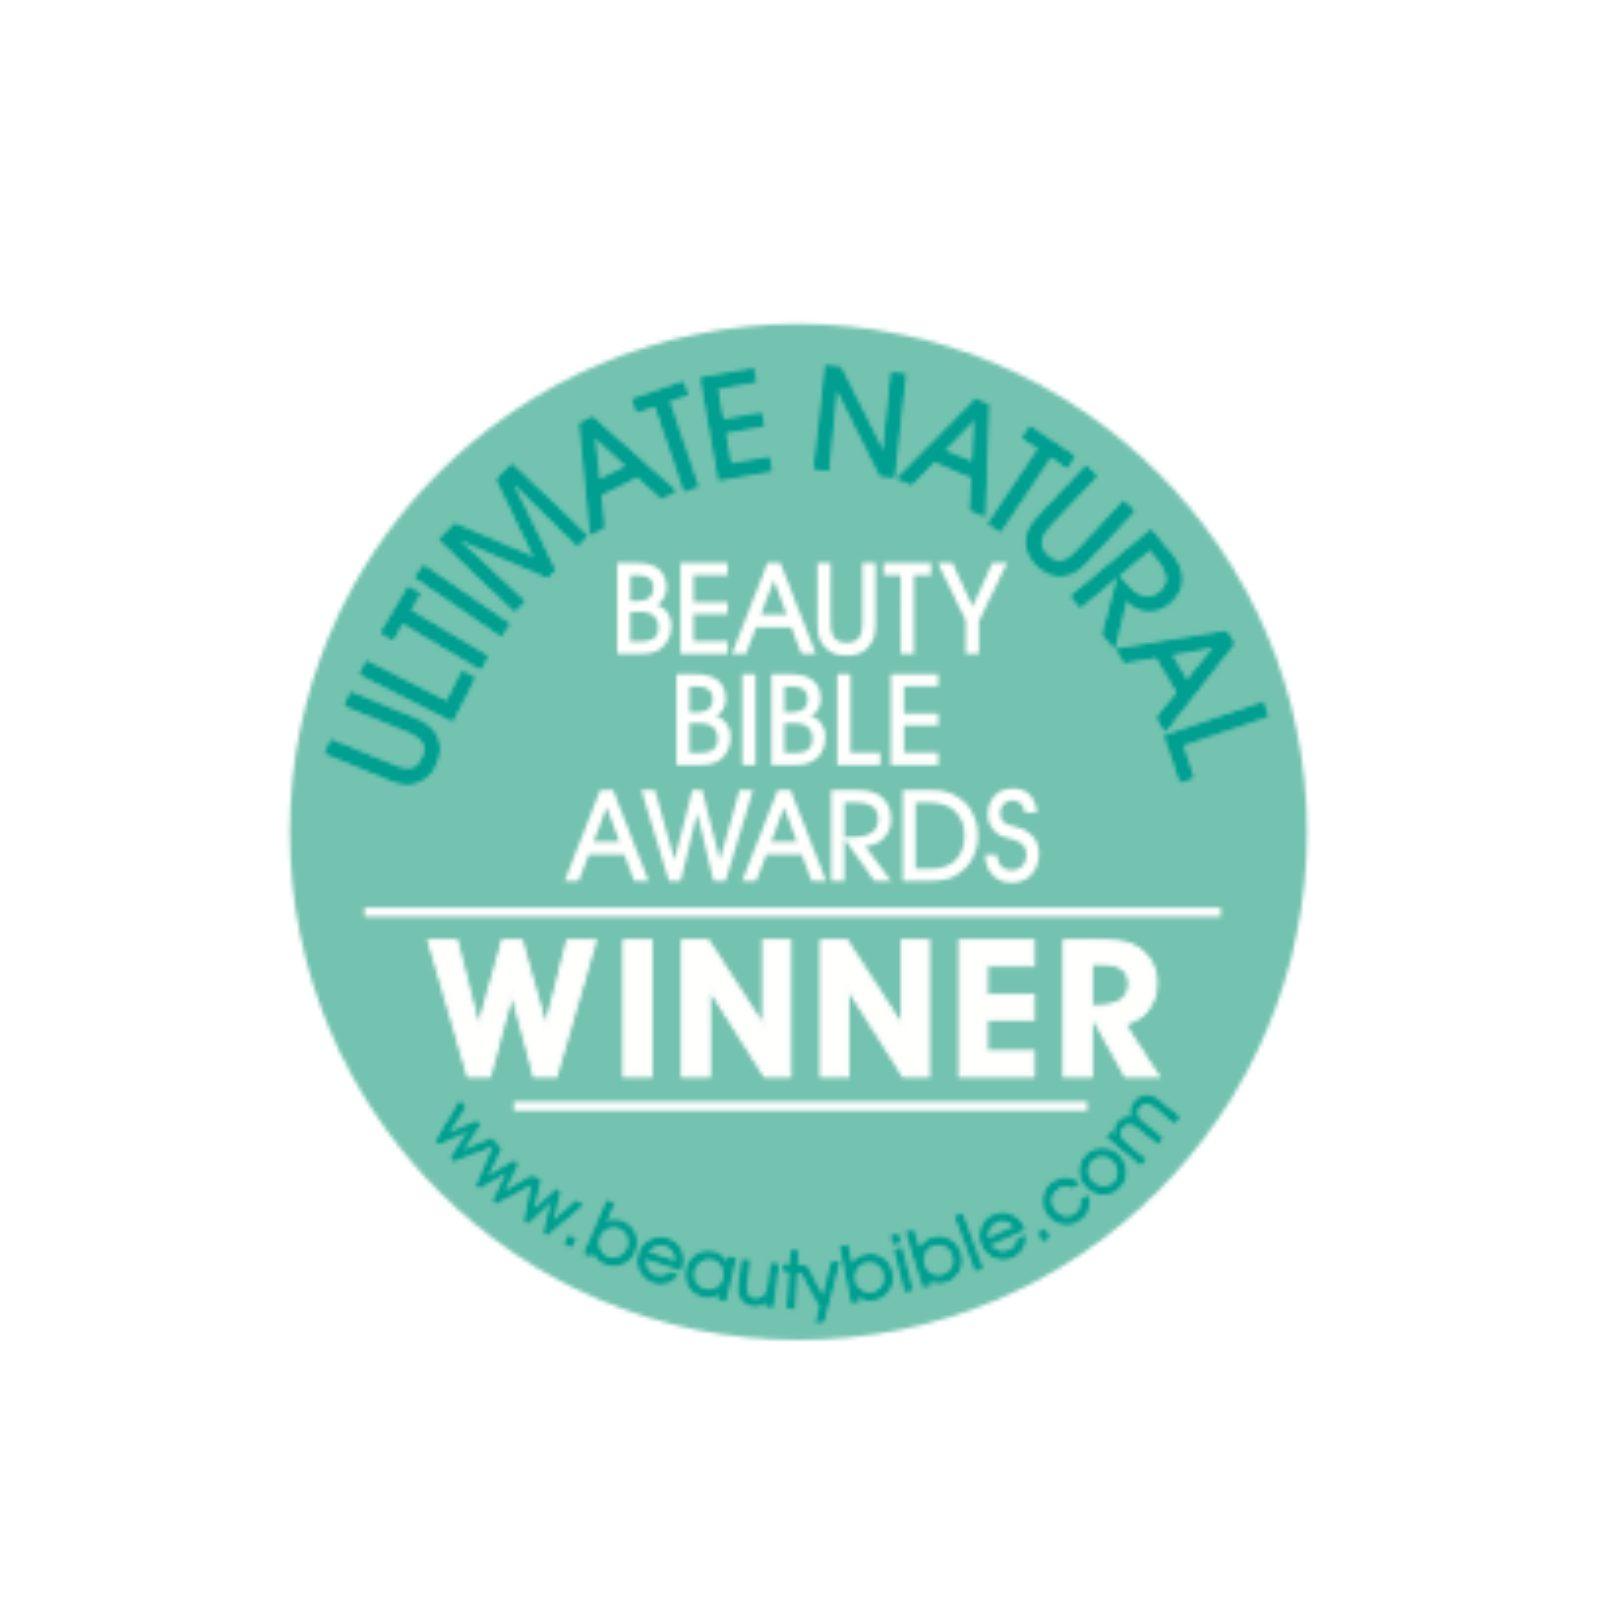 Ultimate natural beauty bible winner logo